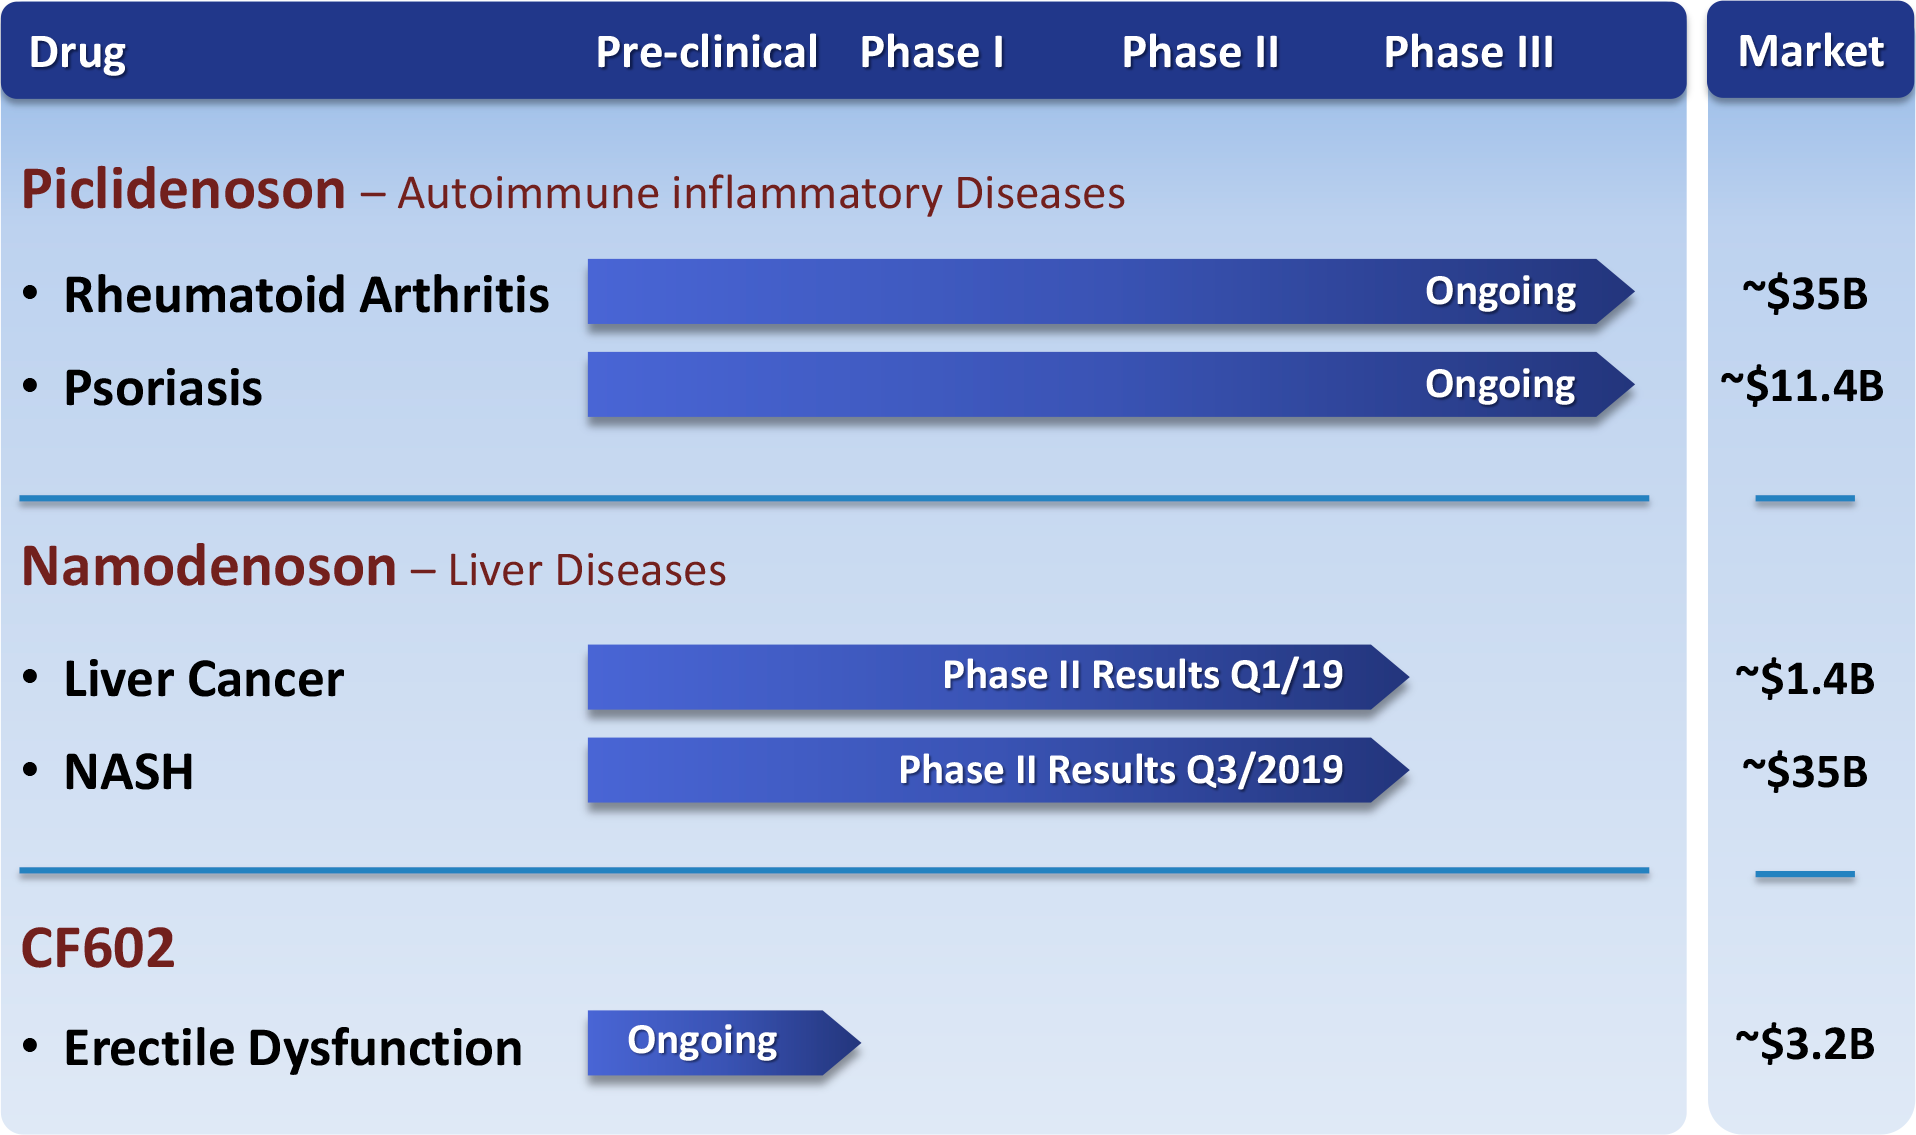 can fite biopharma pipeline - Намоденосон: неоднозначное лекарство против гепатоцеллюлярной карциномы